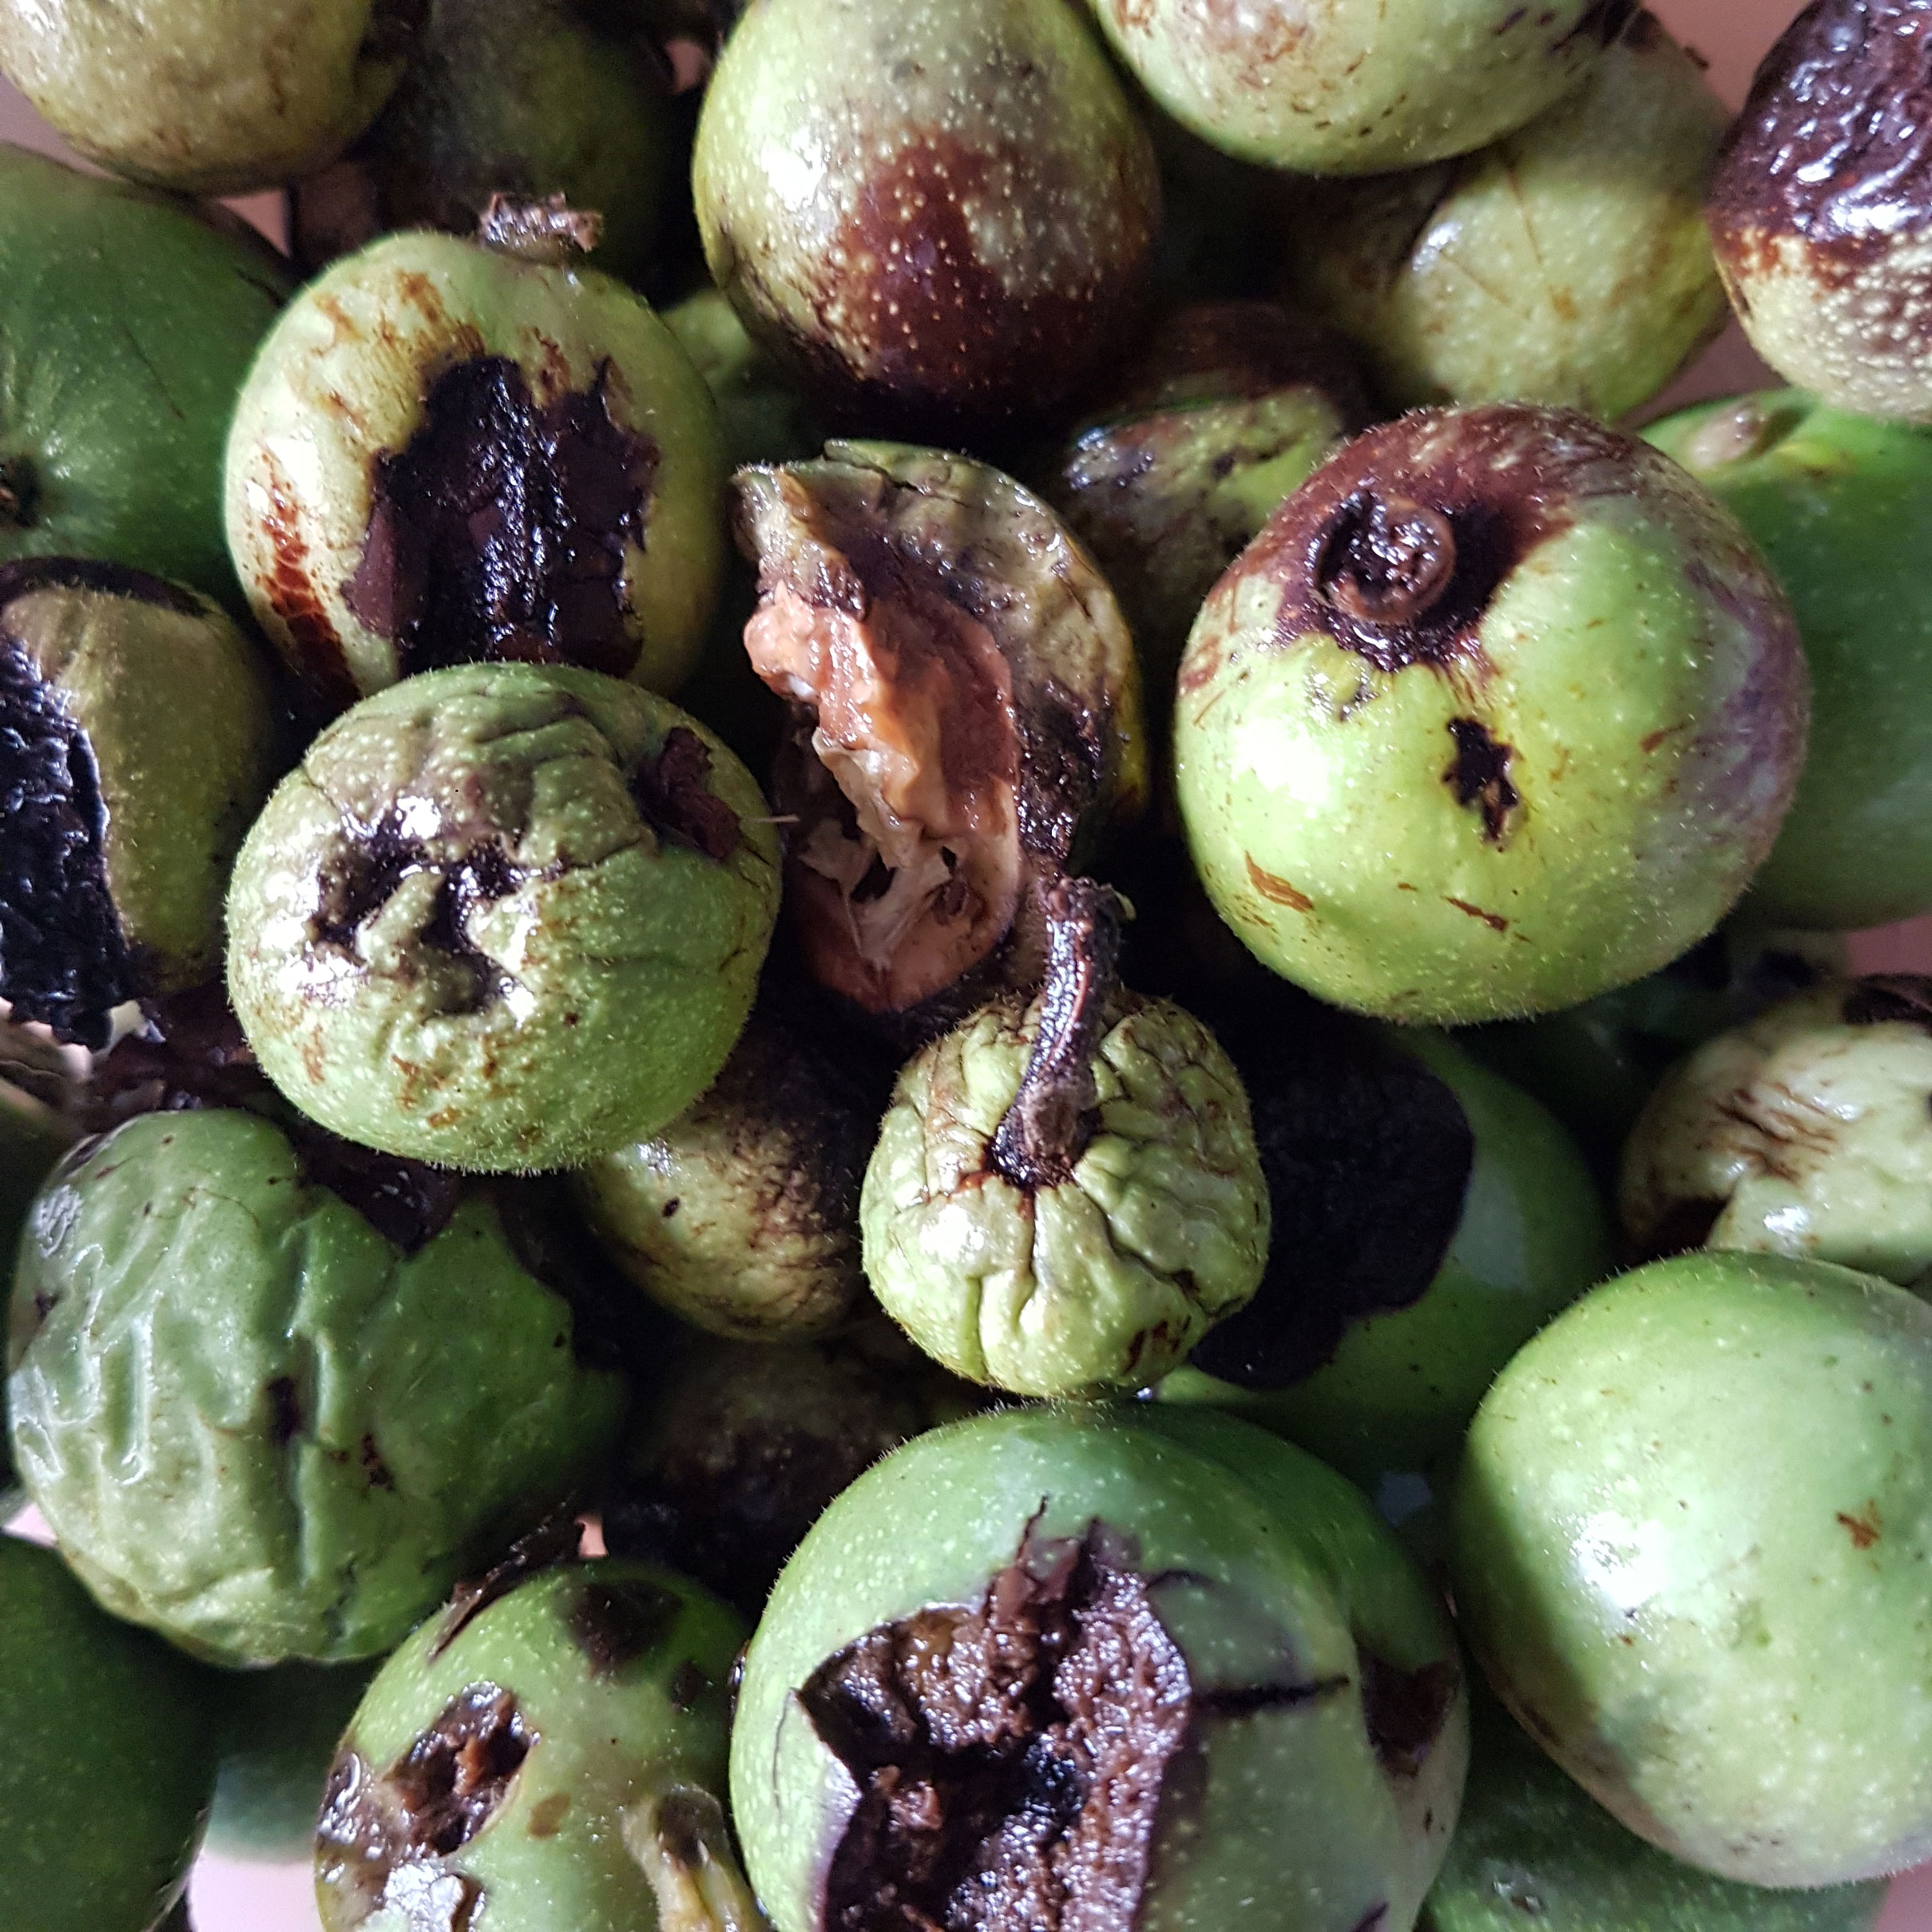 Burns, R. 2018. Fresh Walnuts 2. Photograph.